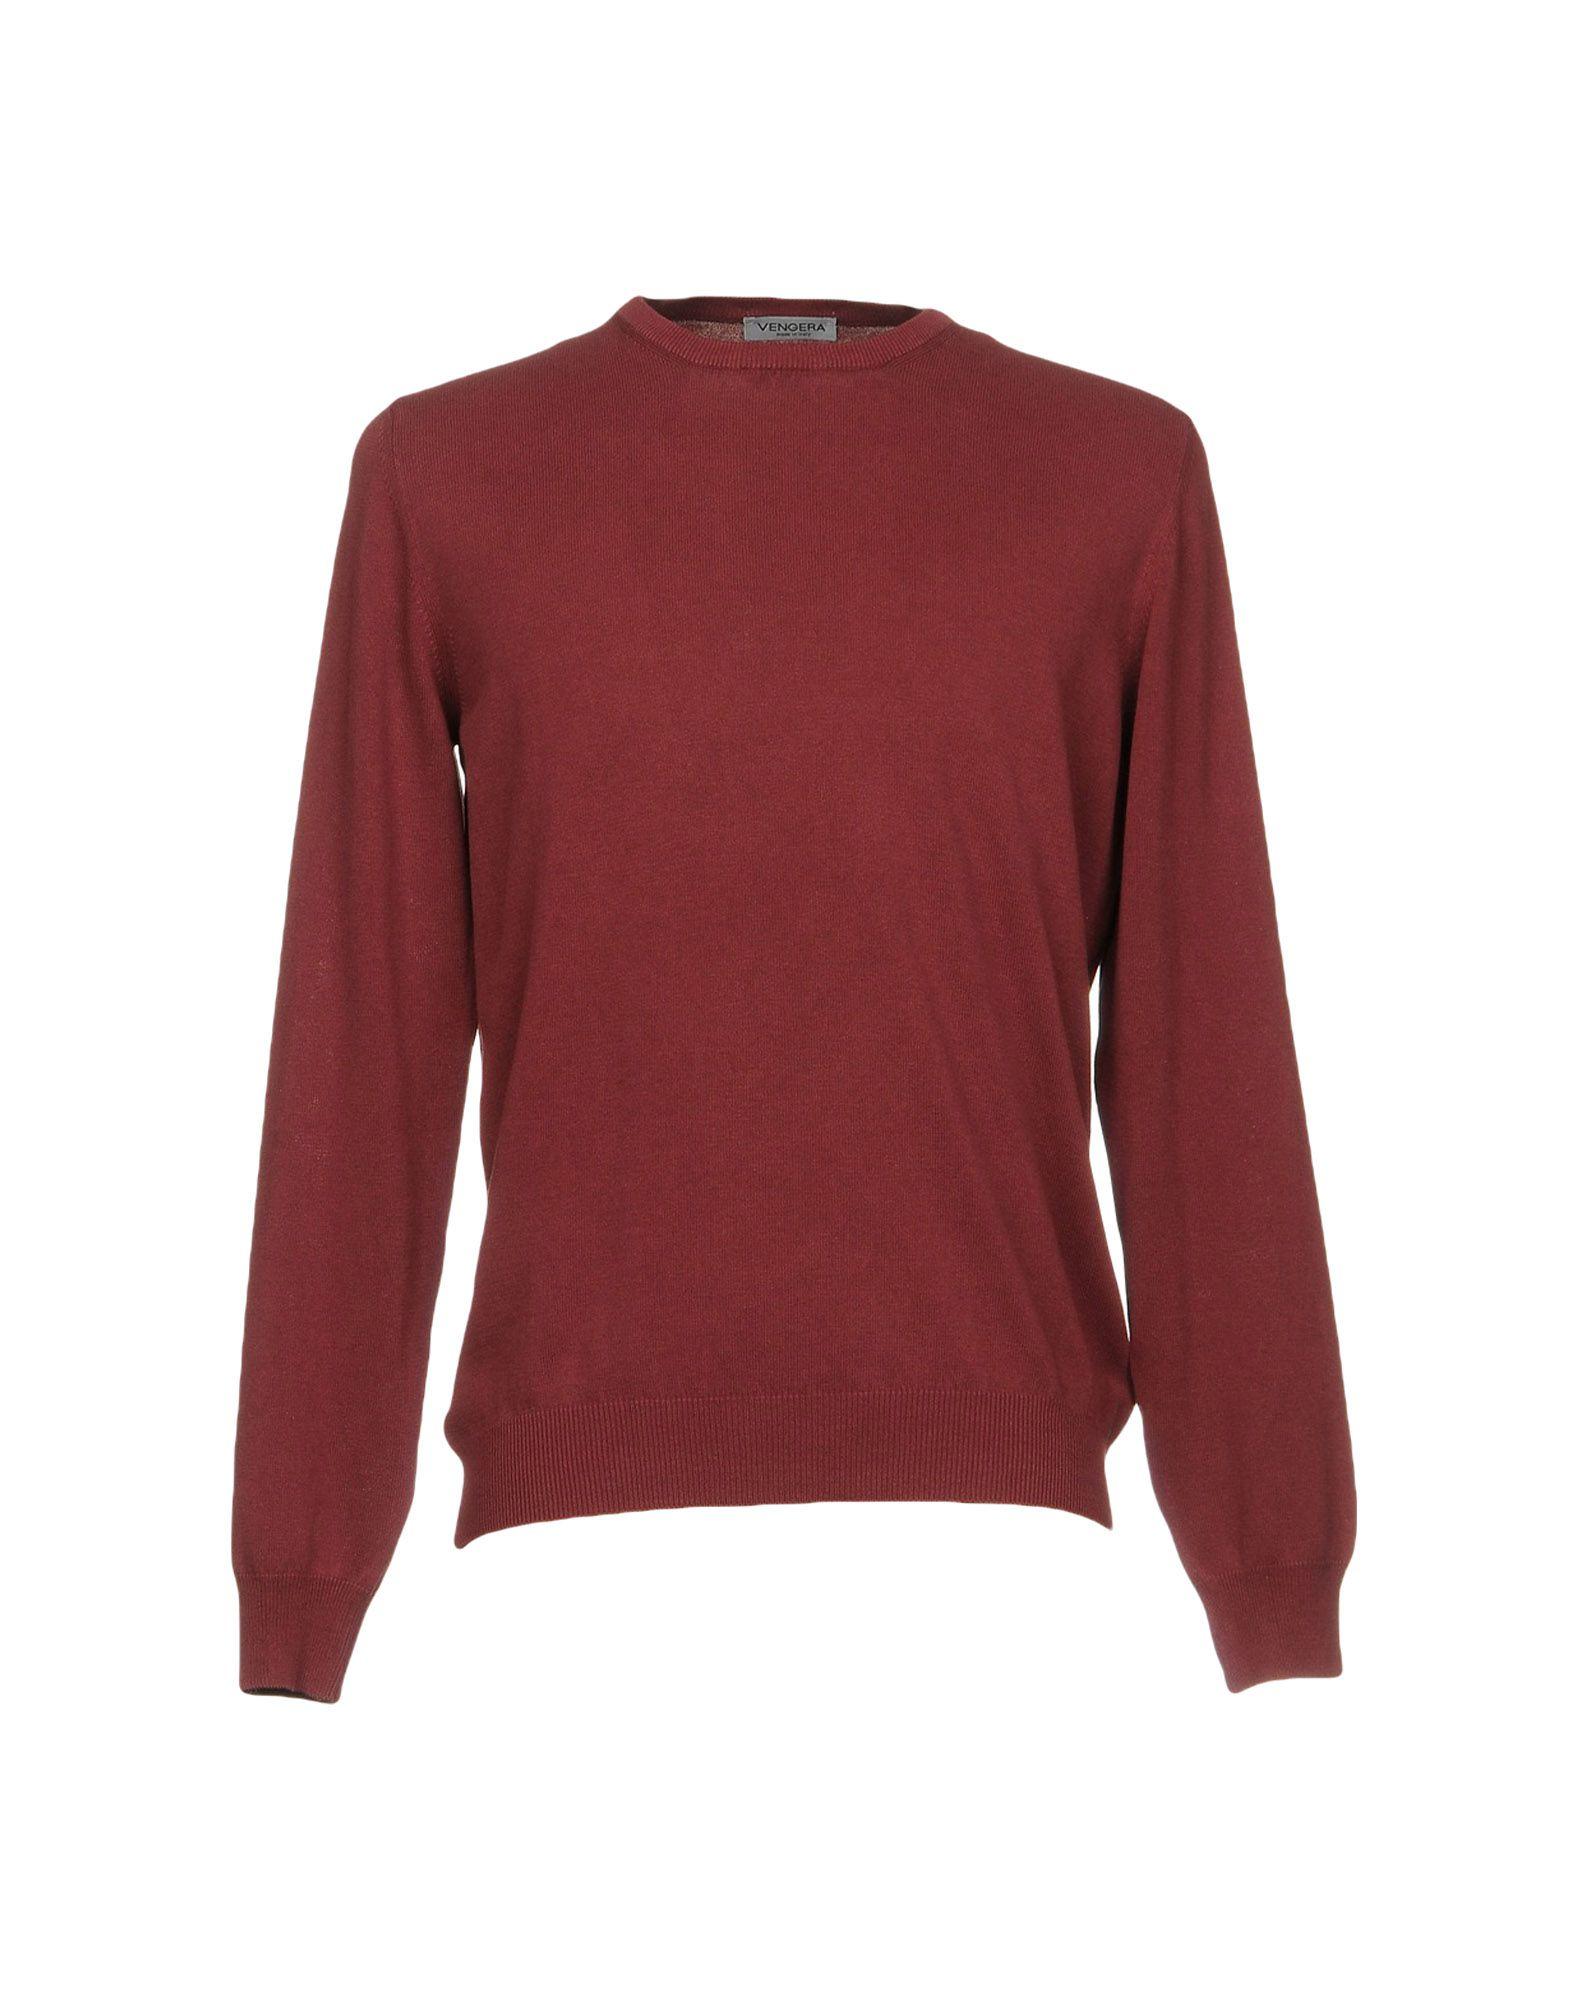 VENGERA Sweater in Maroon